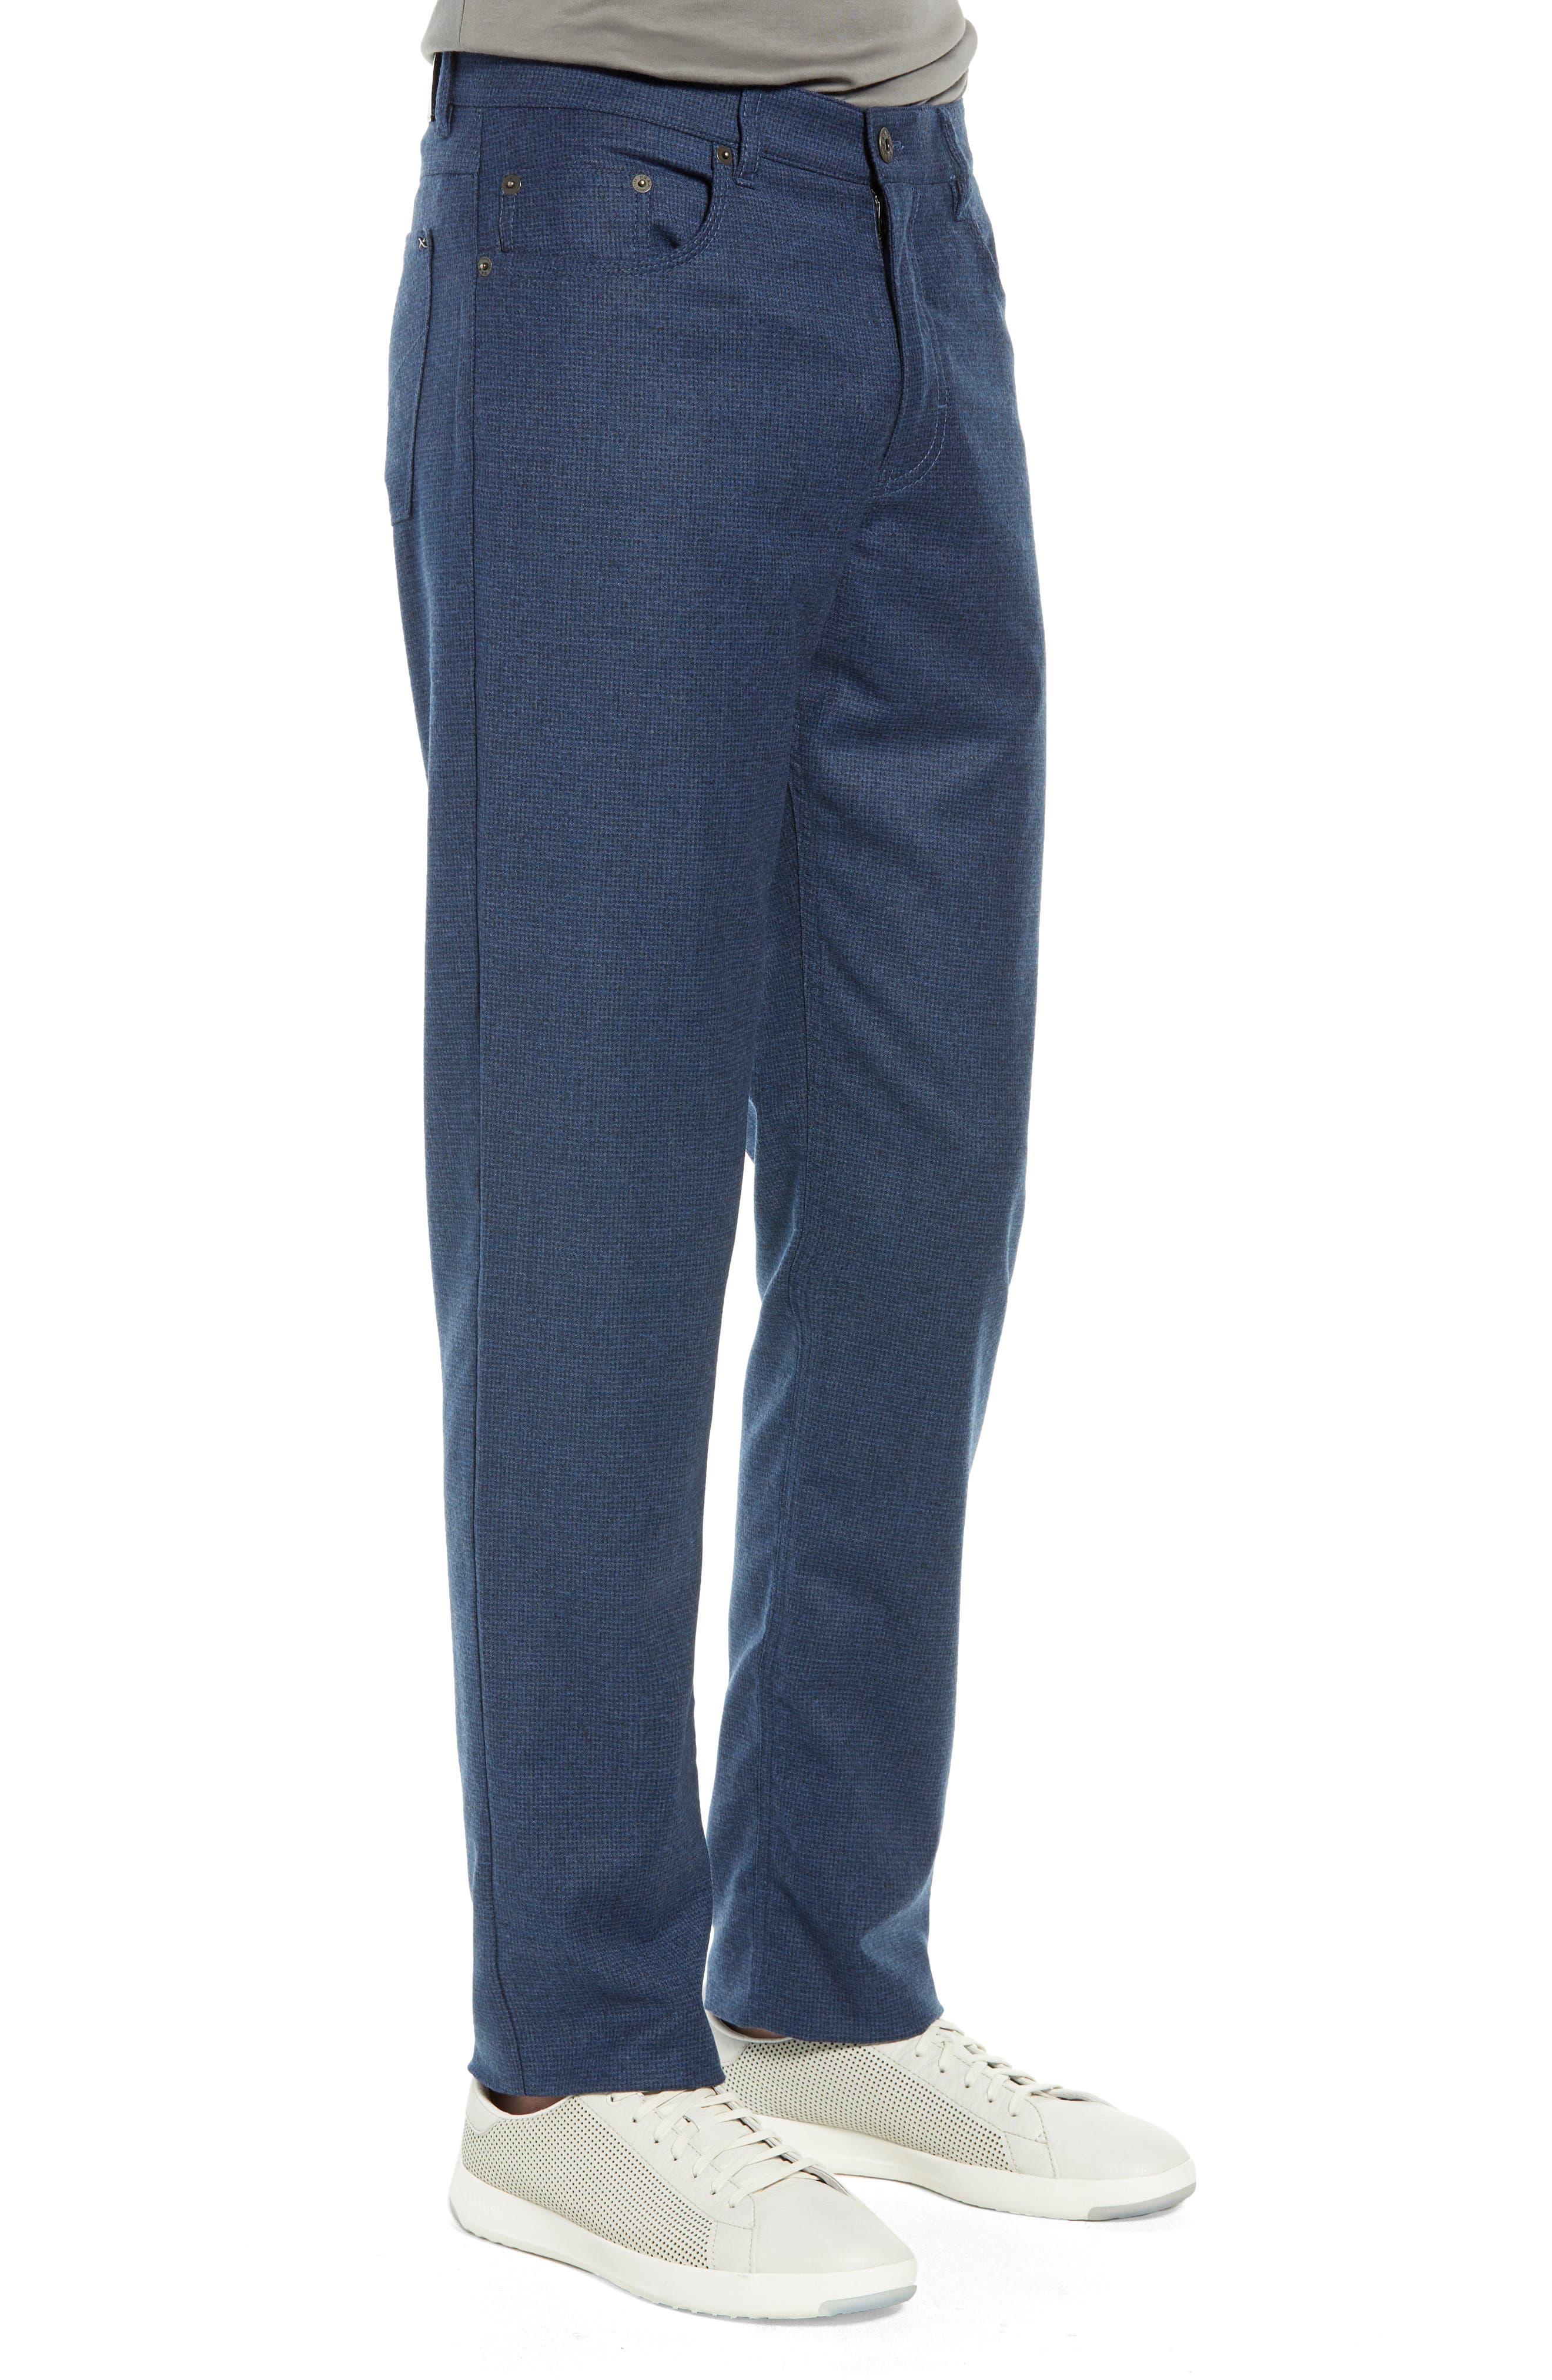 Cadiz Five-Pocket Stretch Wool Trousers,                             Alternate thumbnail 3, color,                             MIDNIGHT